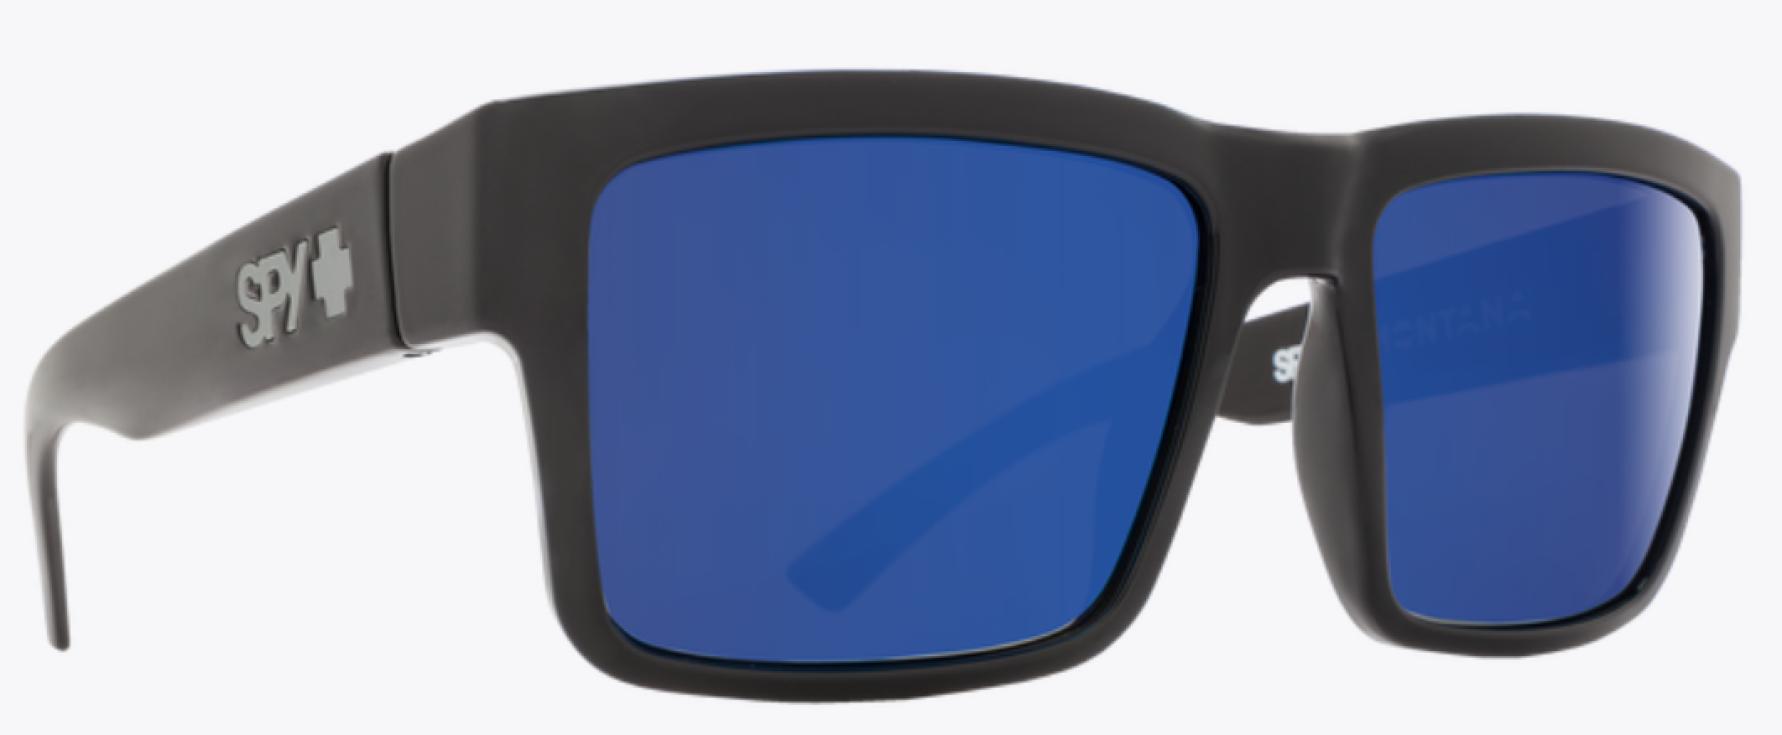 SPY MONTANA BLK BLUE